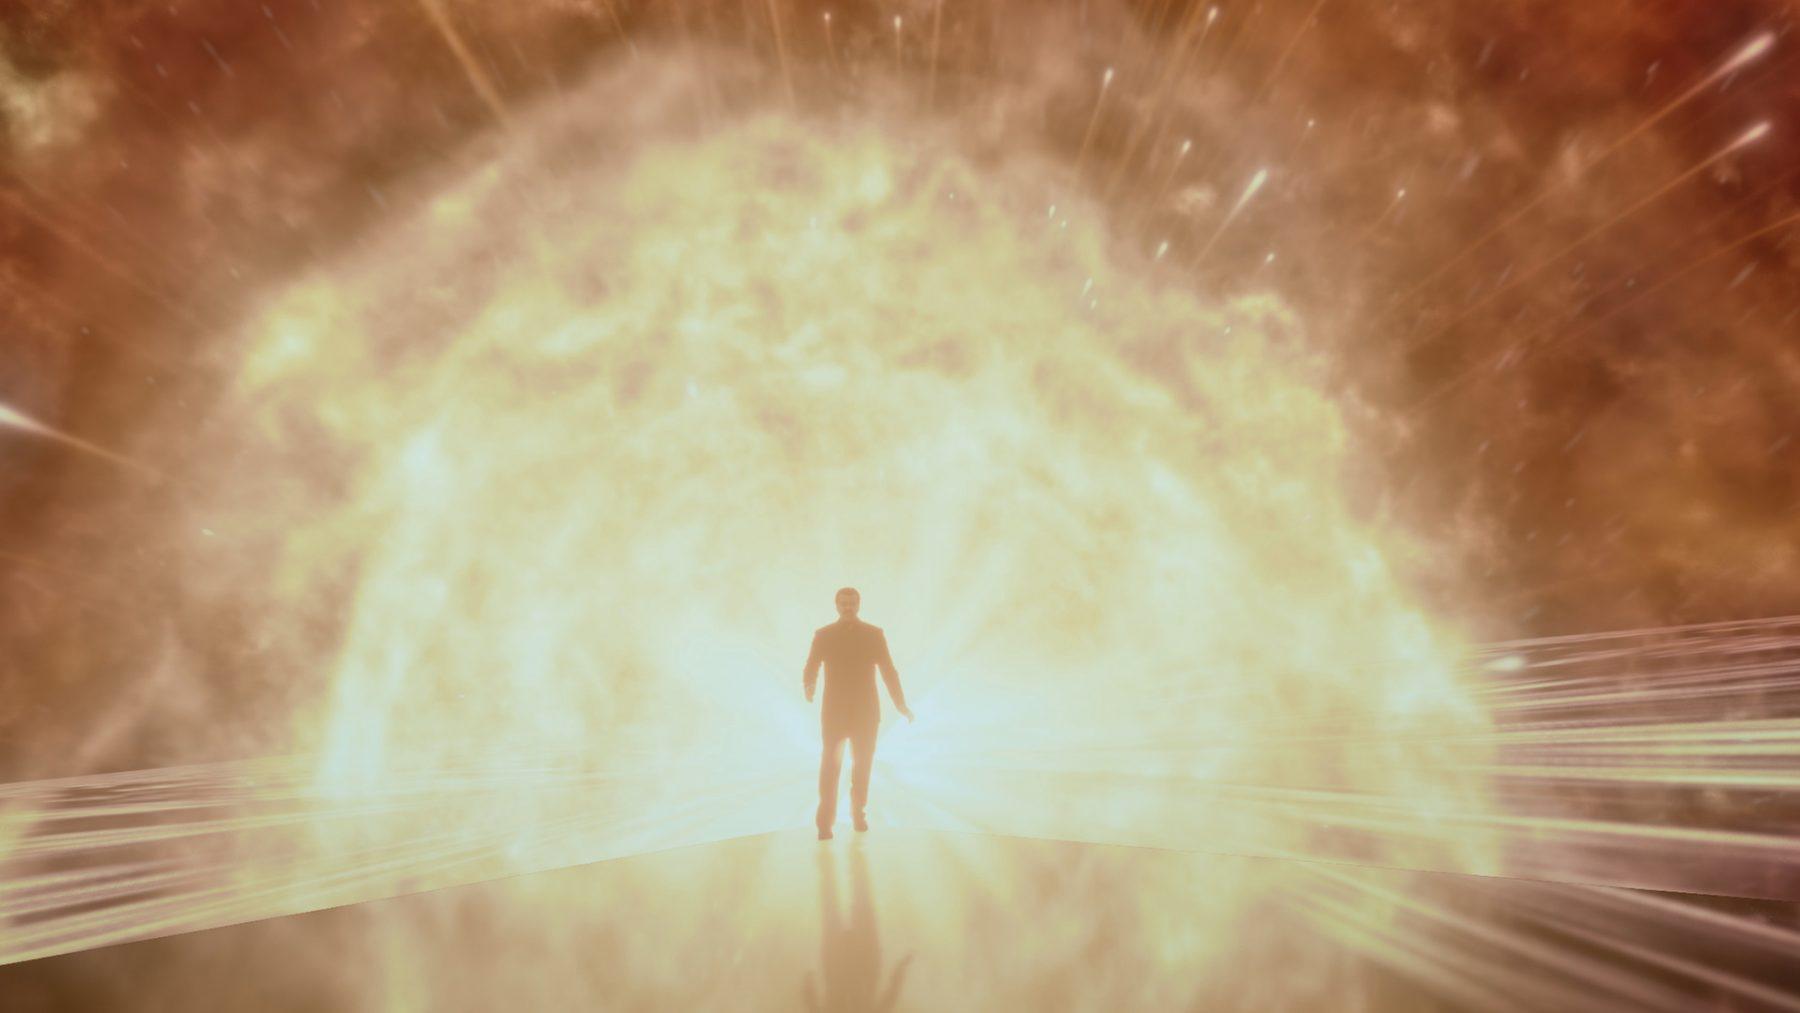 cosmos-mundos-possiveis-serie